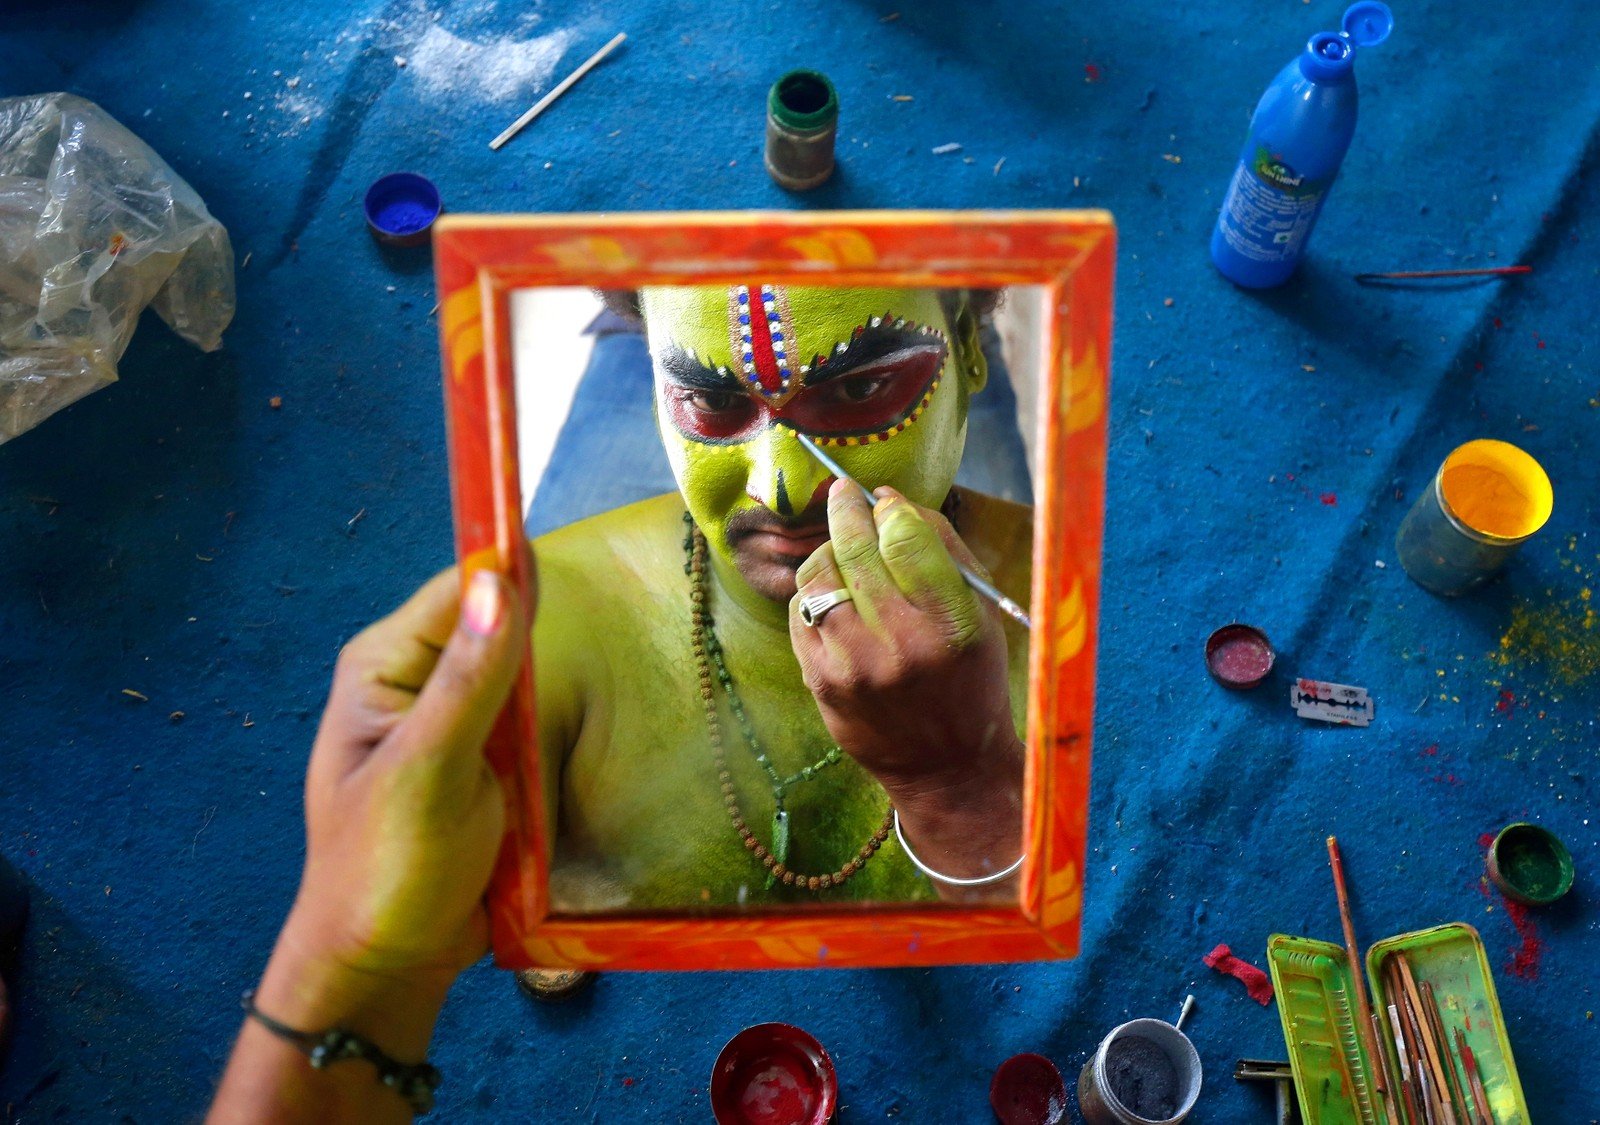 En mann forbereder seg til en hindufestival kalt Ramnavami i Bengaluru i India.